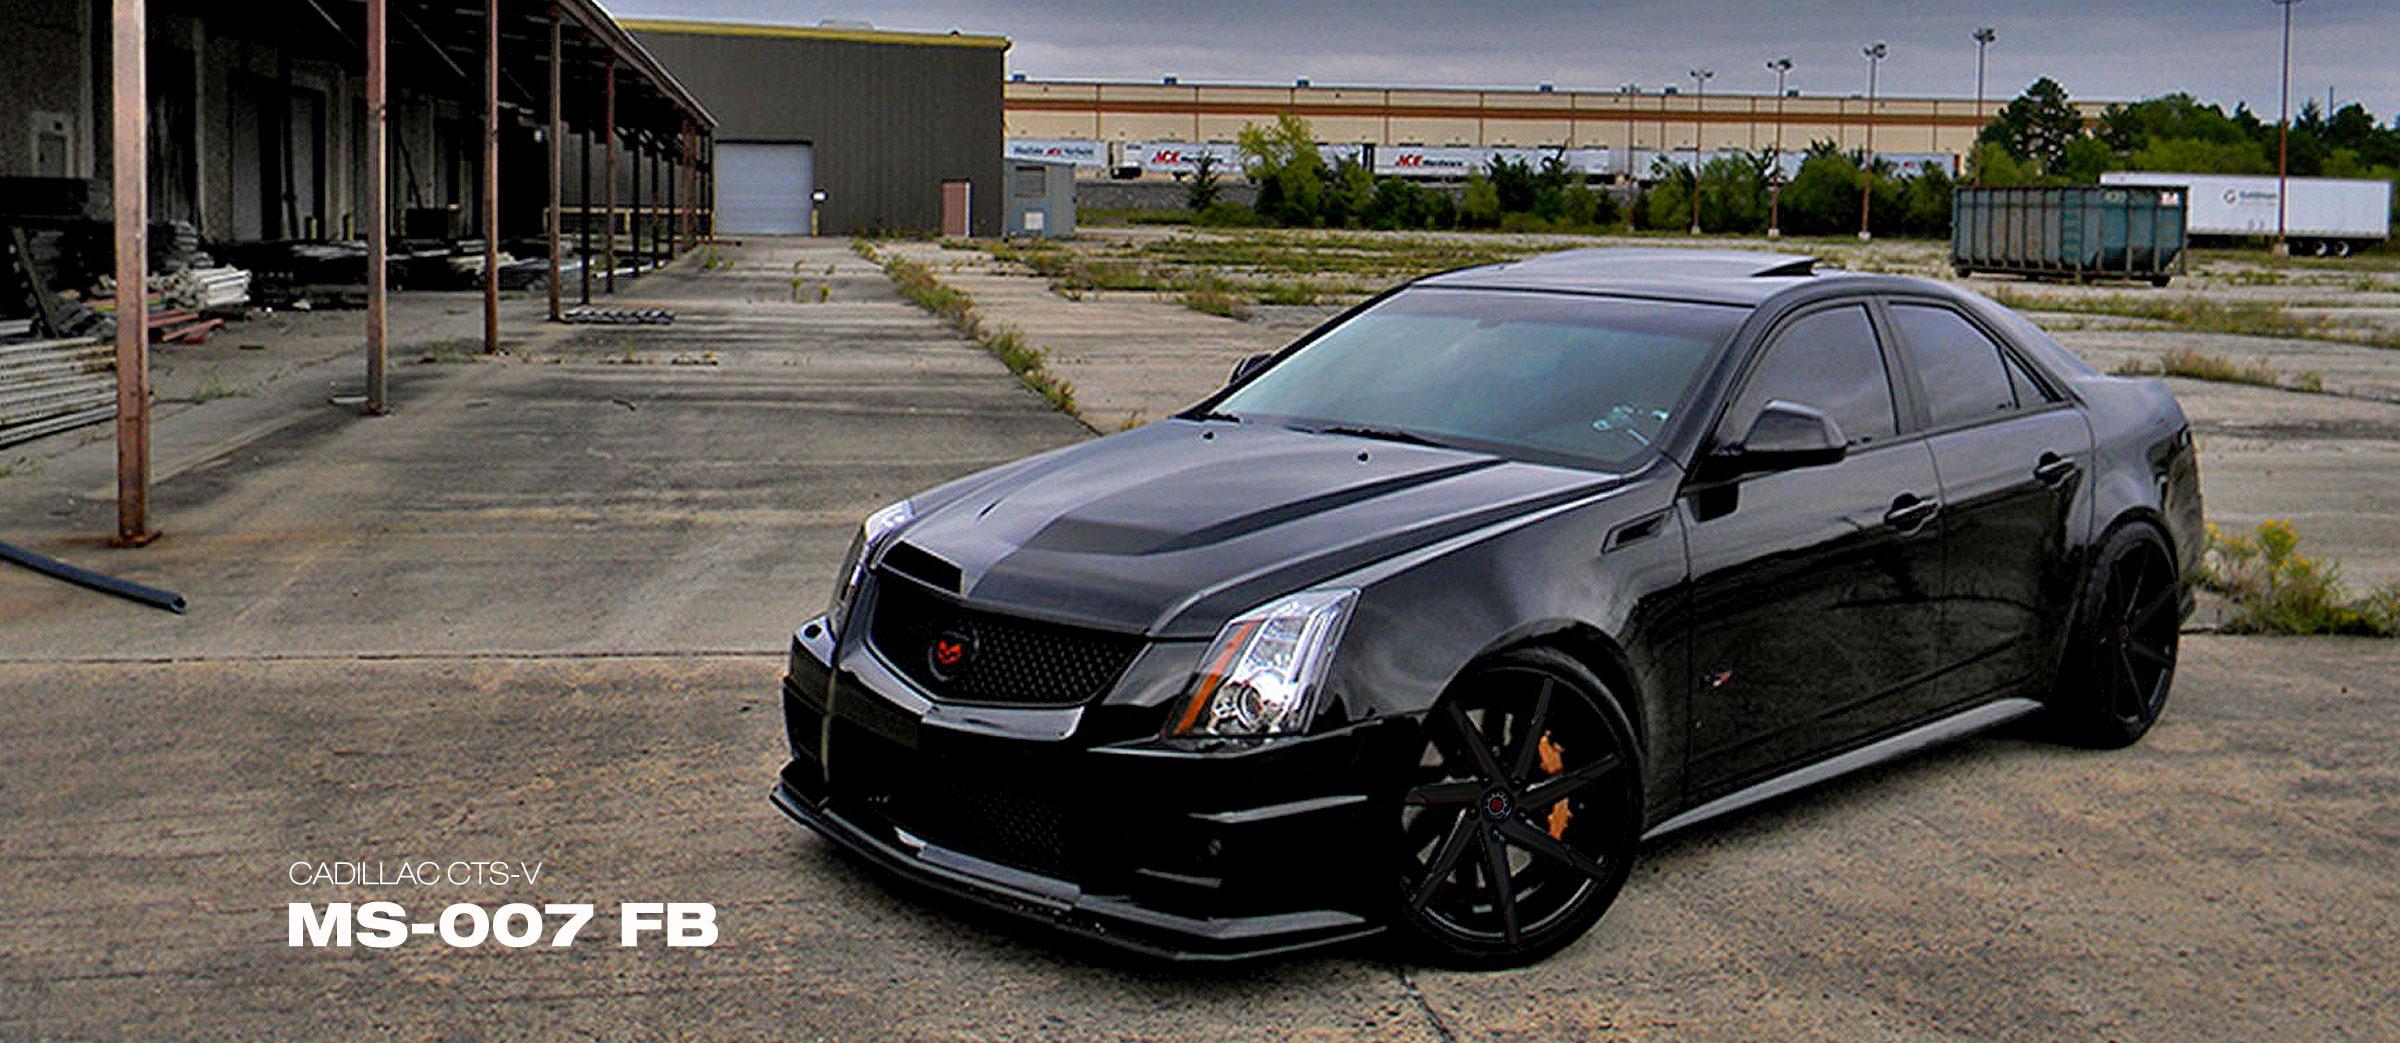 Cadillac CTS-V MS-007 FB